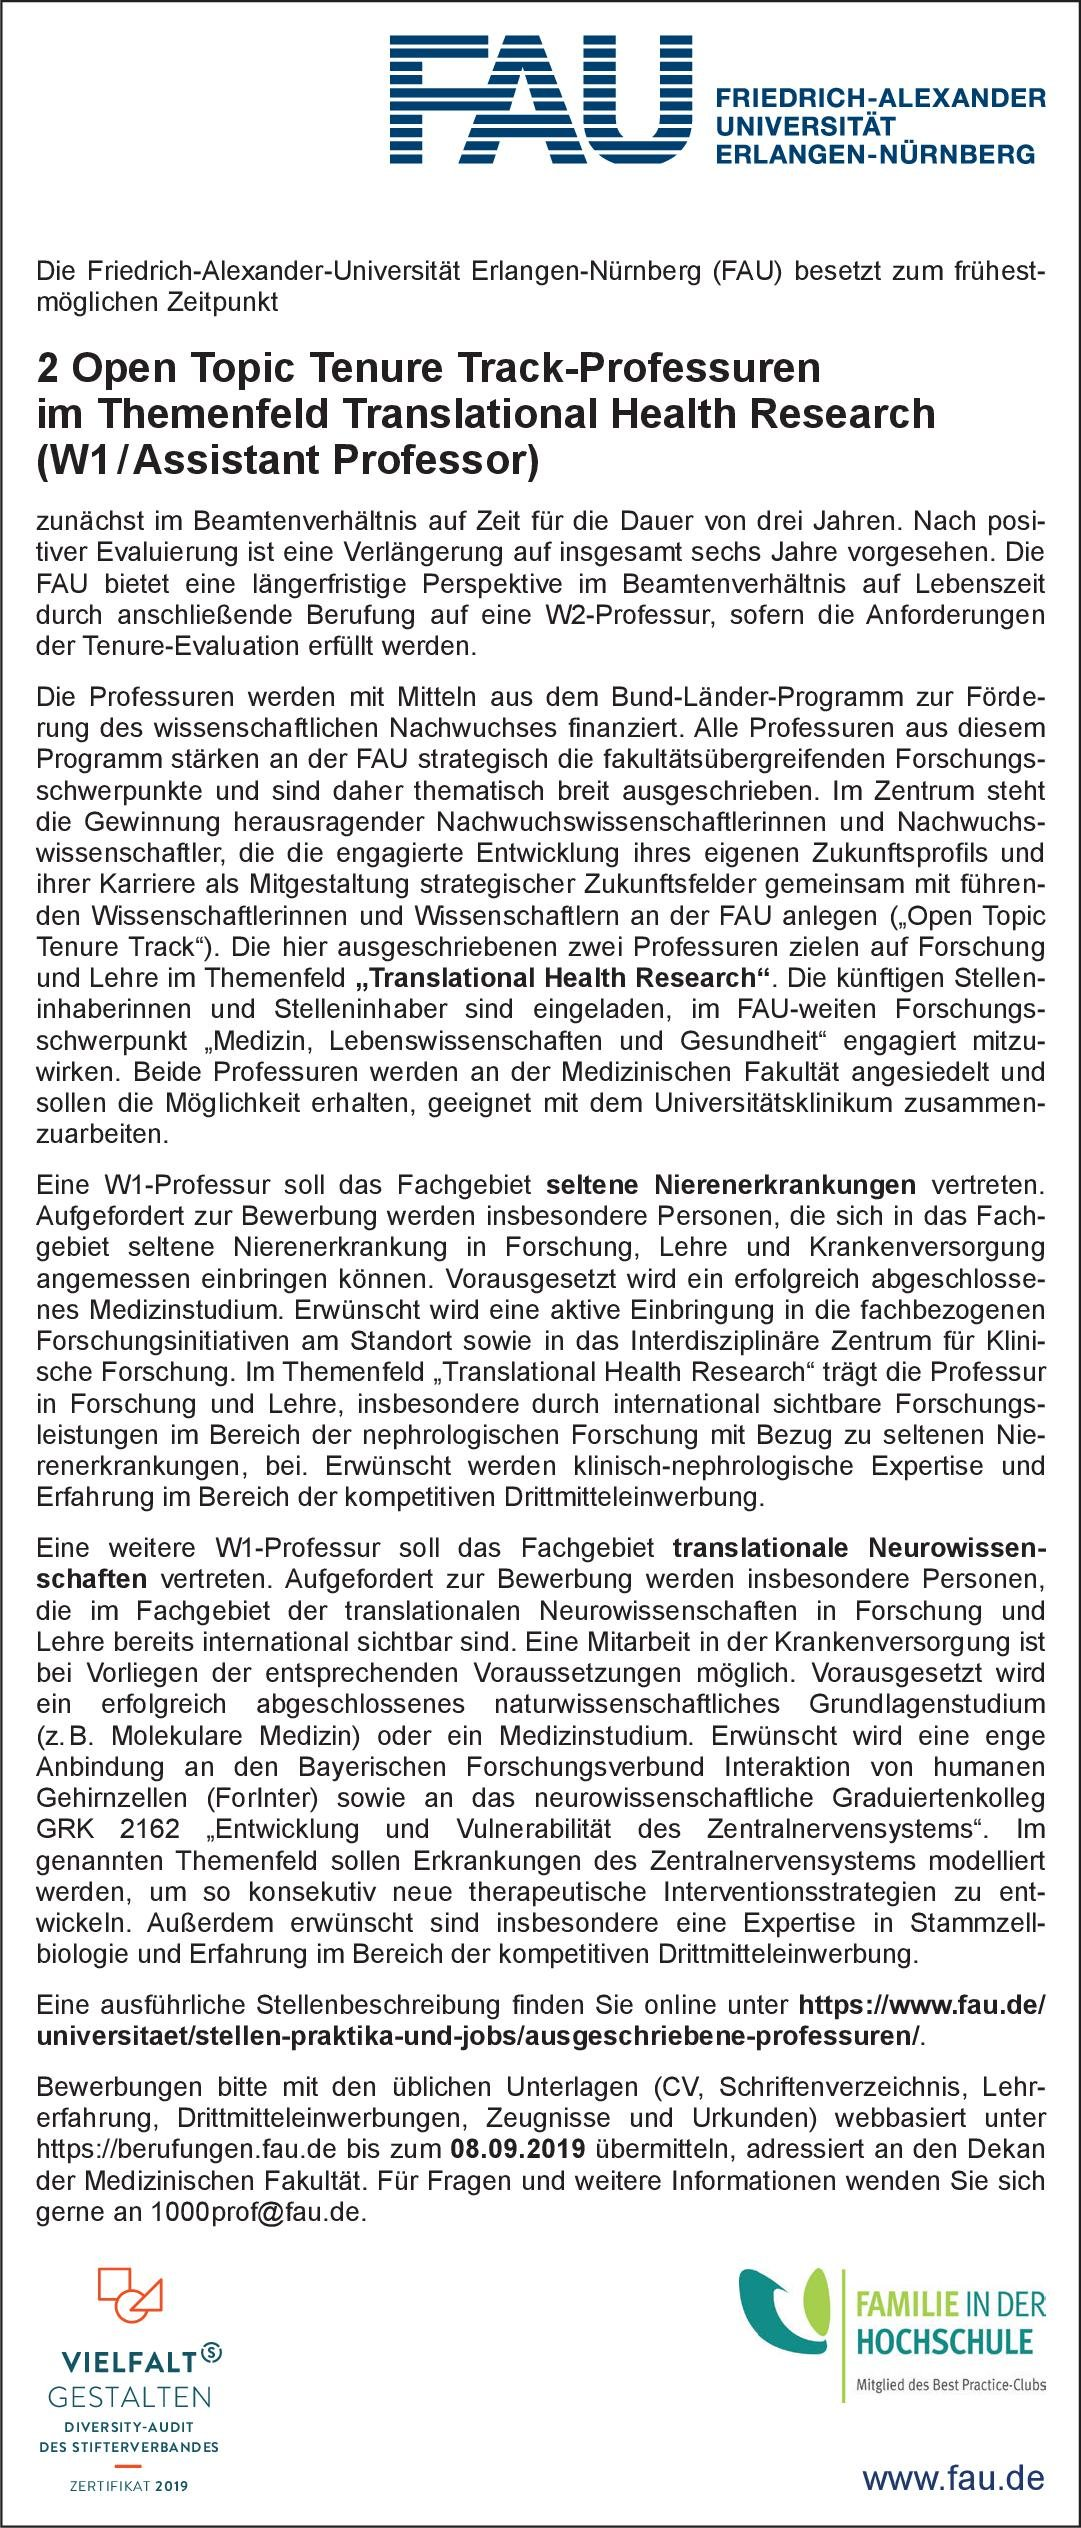 Friedrich-Alexander-Universität Erlangen-Nürnberg (FAU) 2 Open Topic Tenure Track-Professuren im Themenfeld Translational Health Research (W1/Assistant Professor) * ohne Gebiete Professor